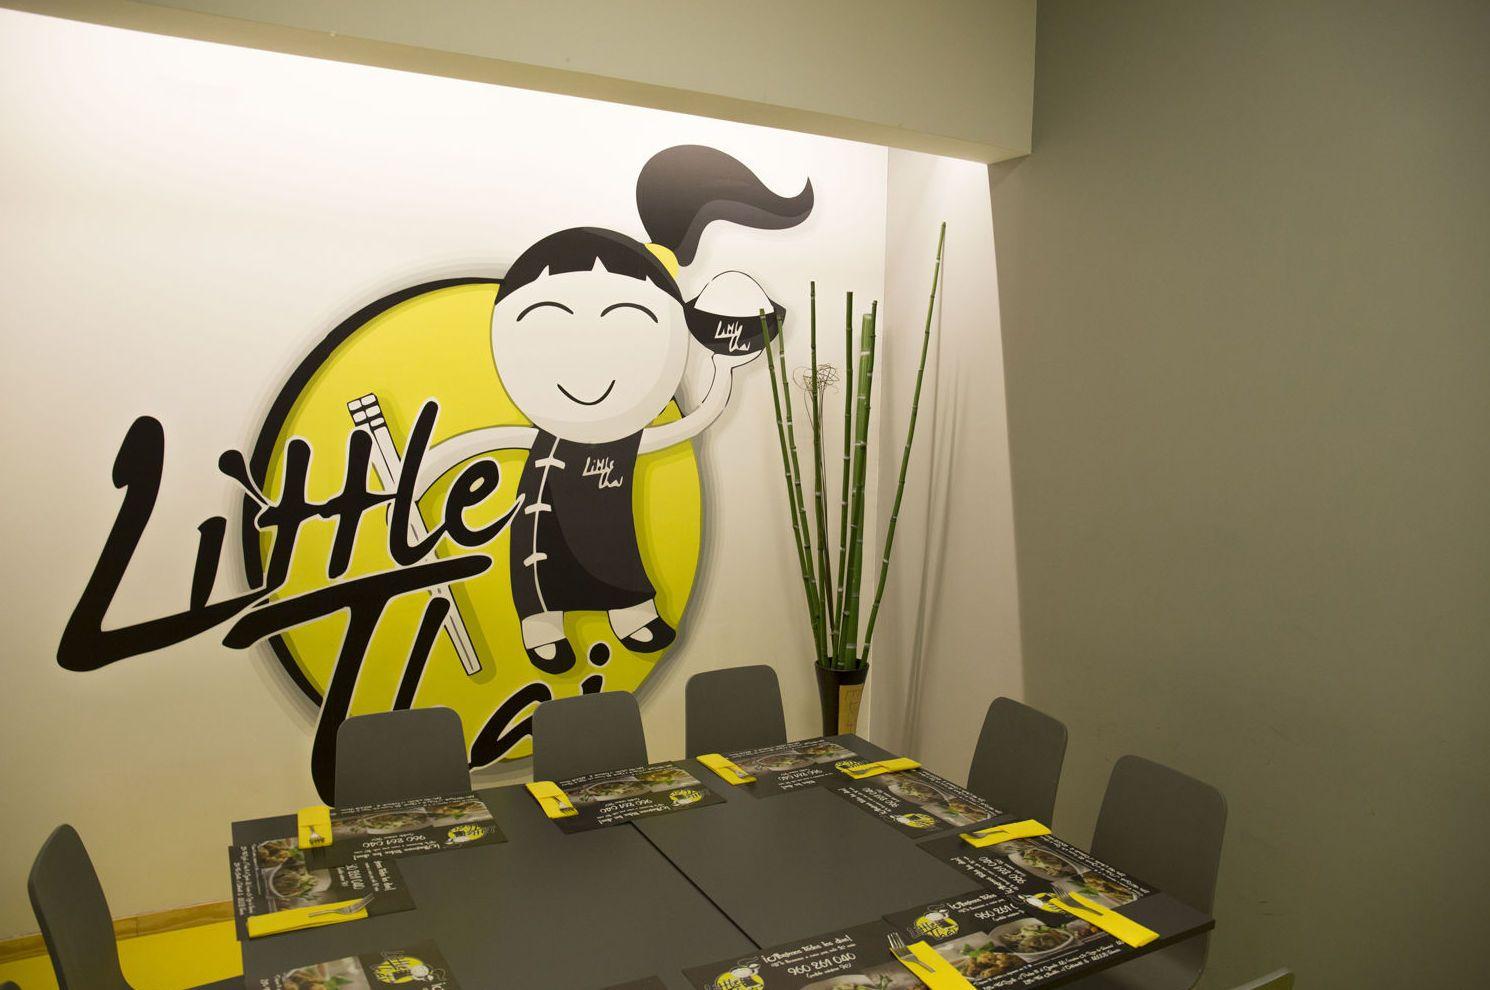 Comidas y cenas para grupos: Carta de Platos de Restaurante Little Thai